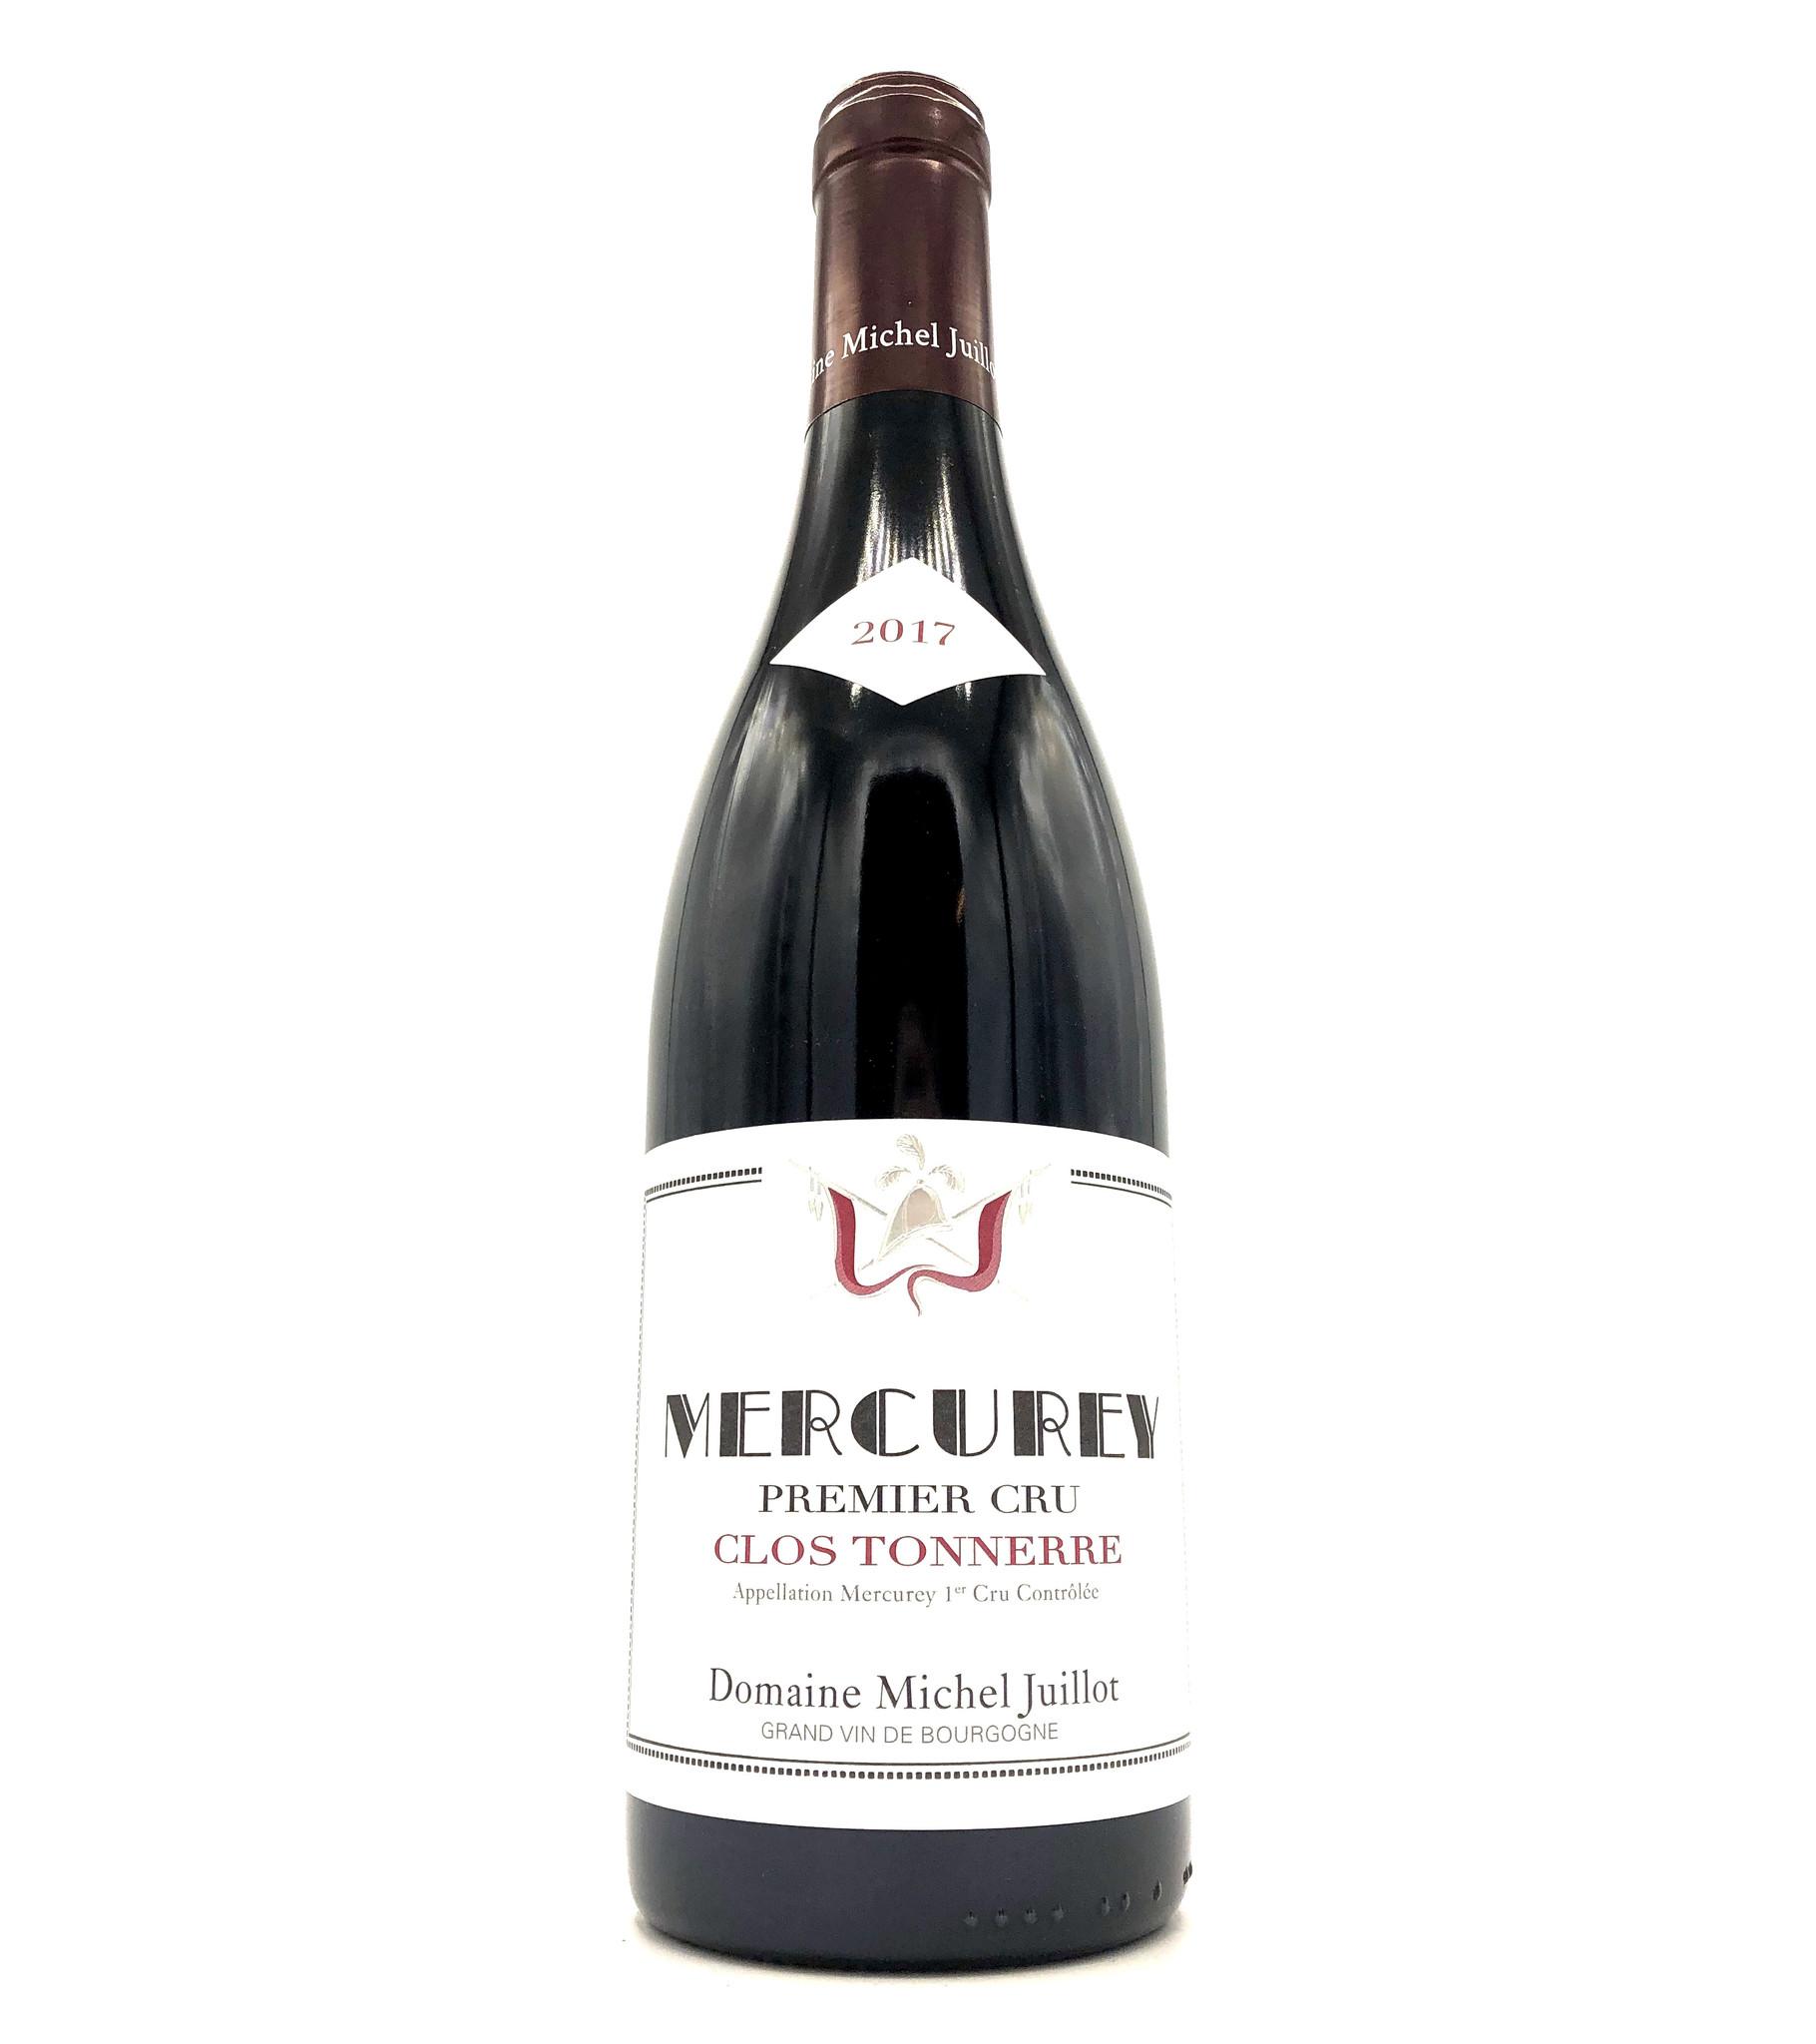 Mercurey Premier Cru Clos Tonnerre 2017 Domaine Michel Juillot